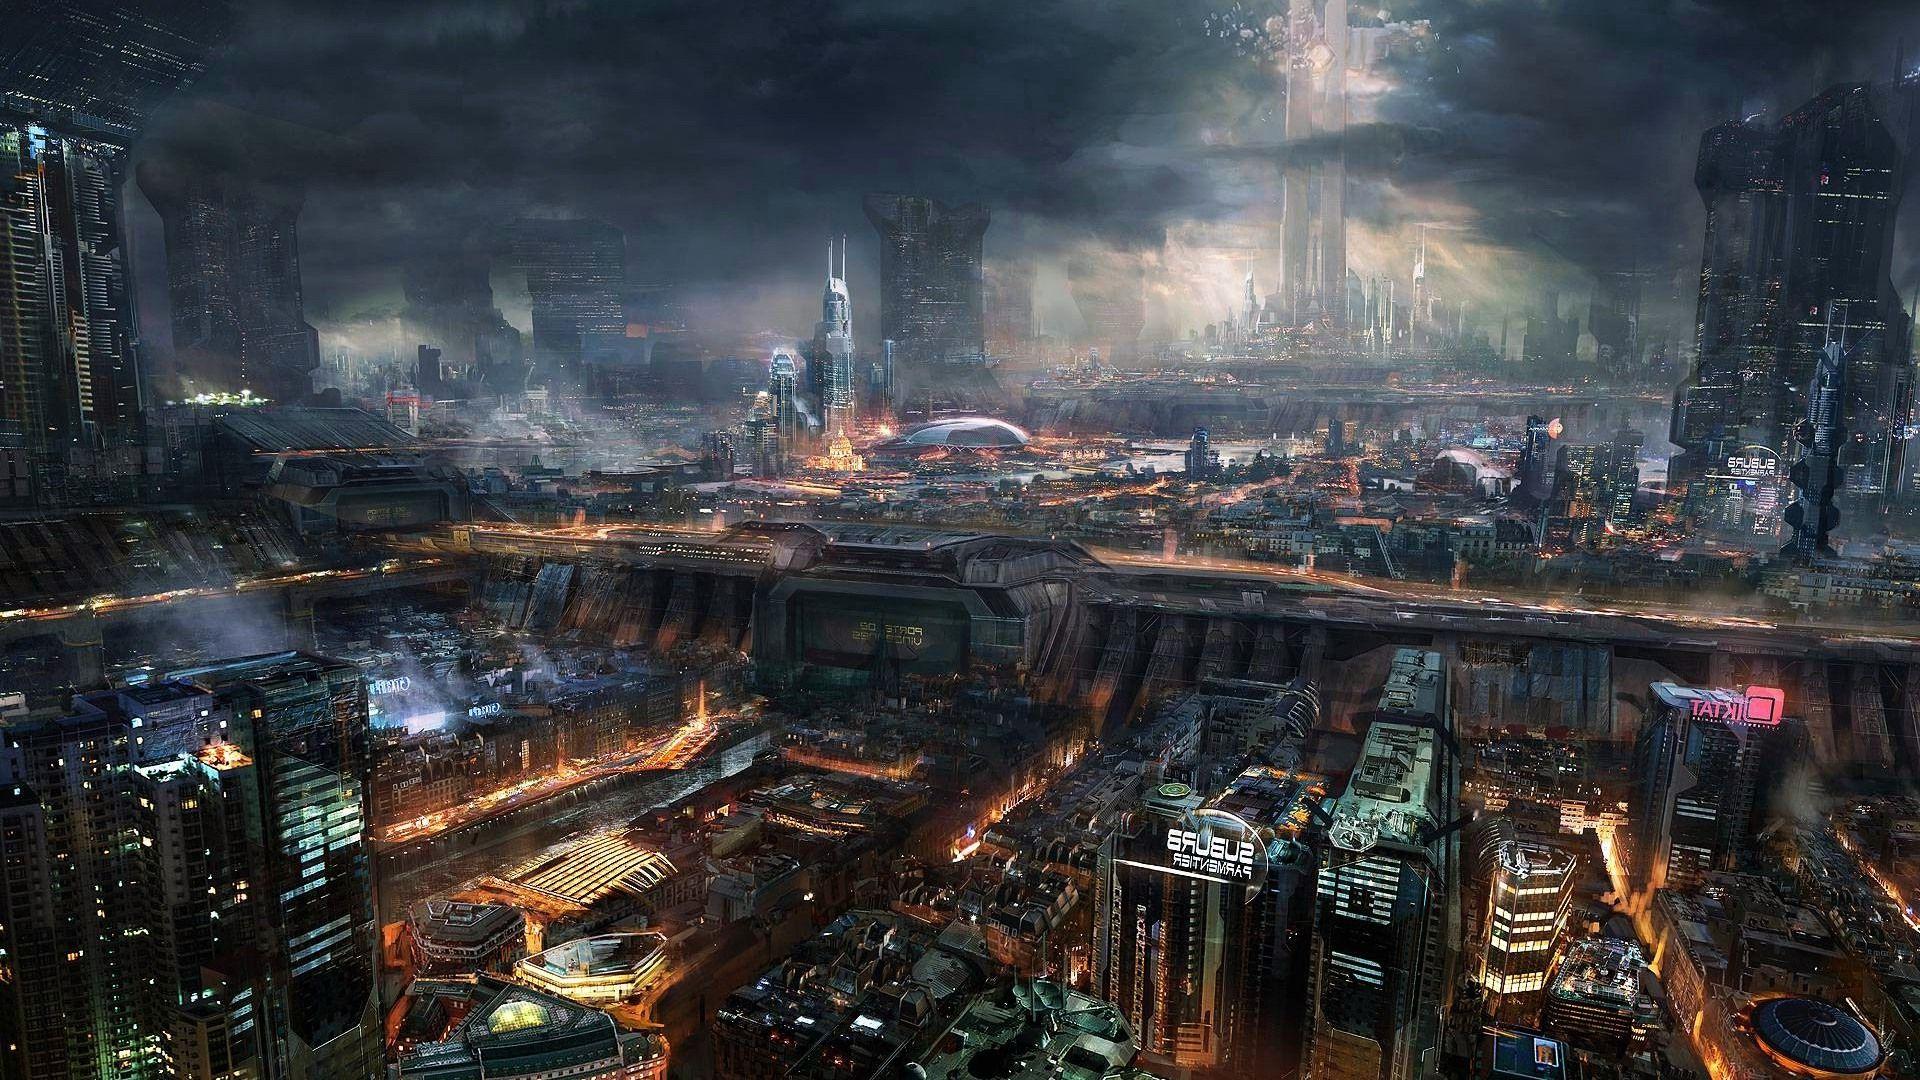 Cyberpunk Landscape 1920x1080 R Wallpapers Steampunk City Futuristic City Steampunk Wallpaper